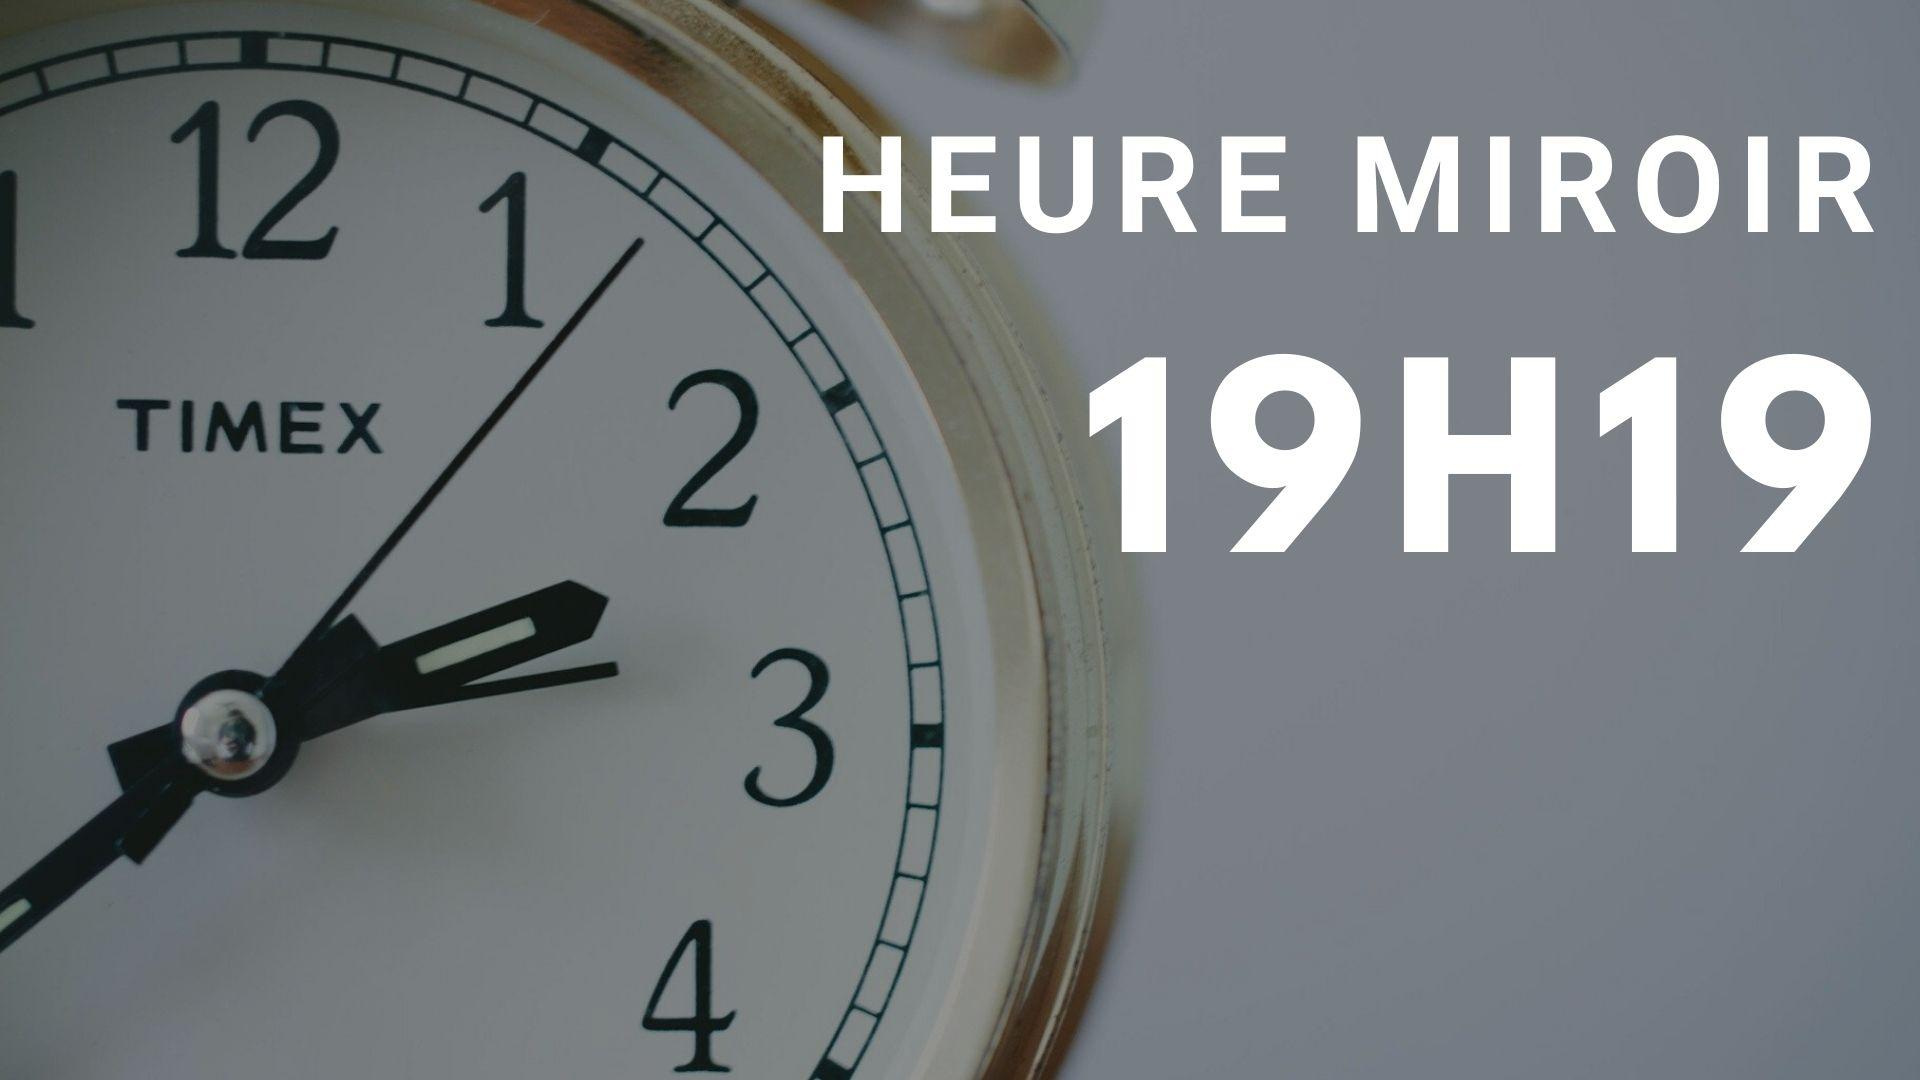 heure miroir 19h19